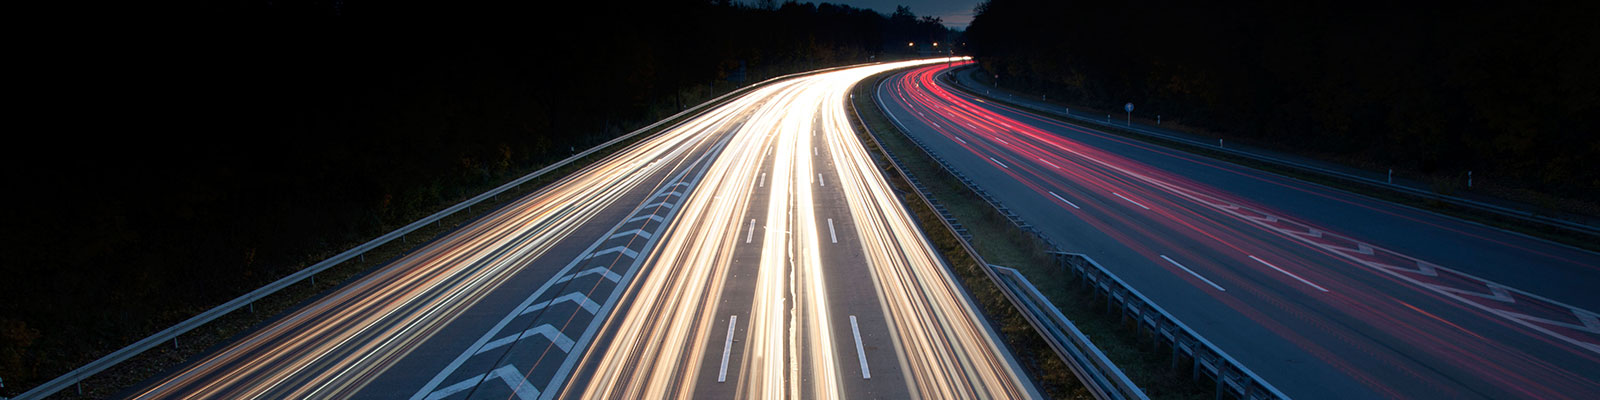 Exim Transport GmbH - Downloads